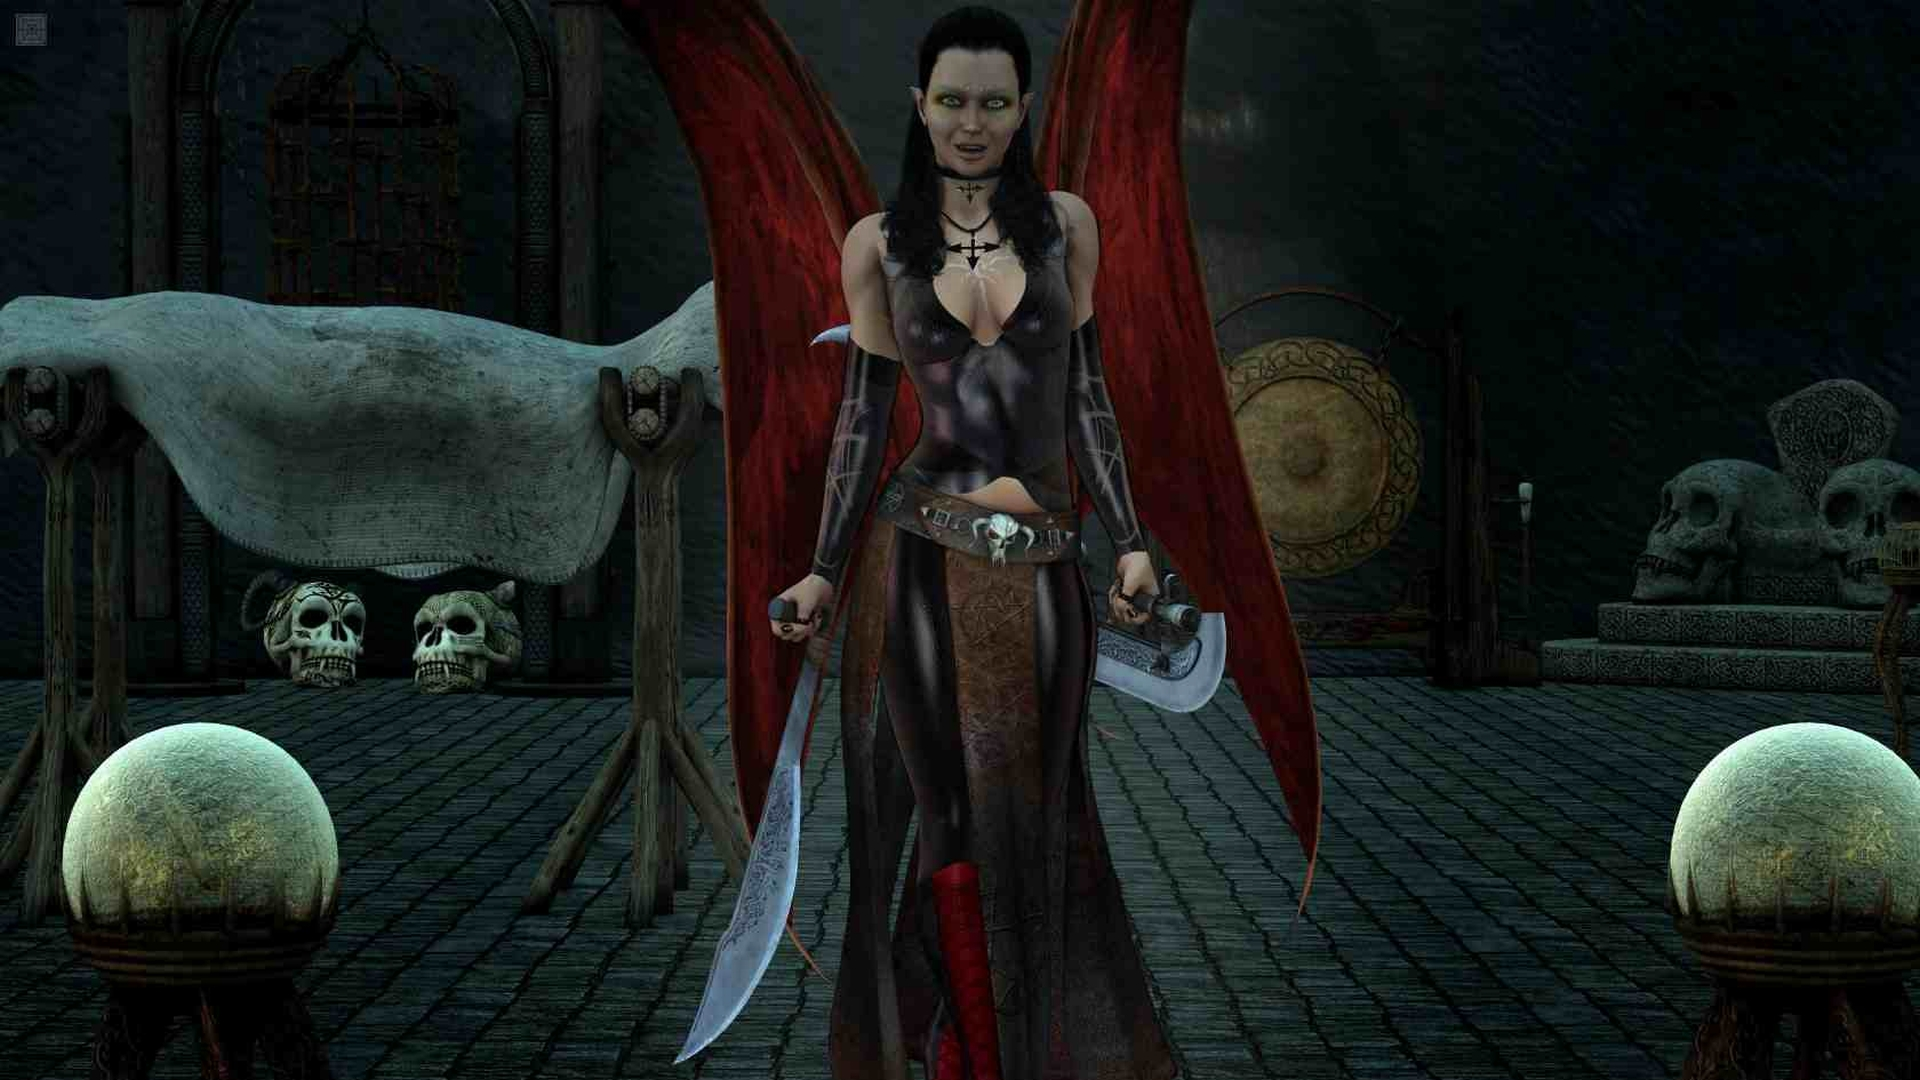 Gothic Girl Wallpaper Iphone Vampire Hd Wallpaper Background Image 1920x1080 Id